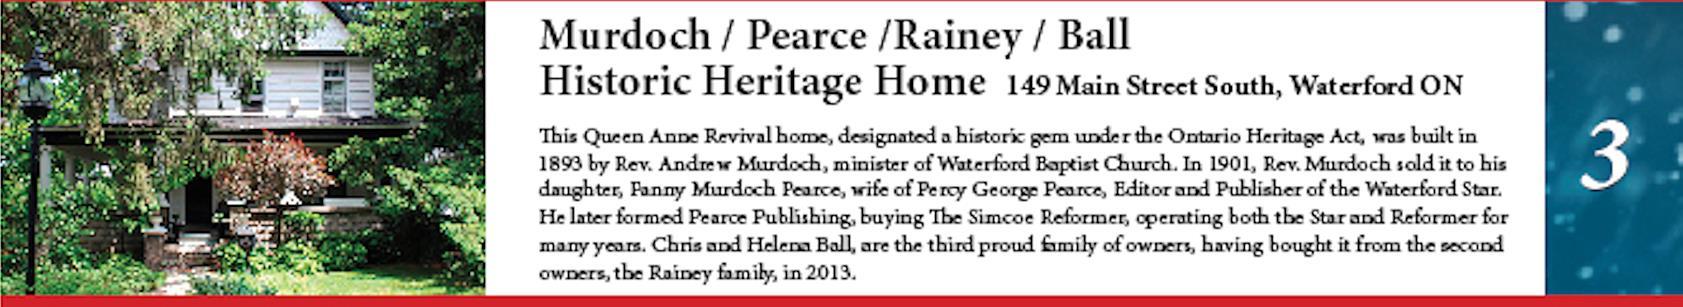 Murdoch/Pearce/Rainey/Ball Historic Heritage home